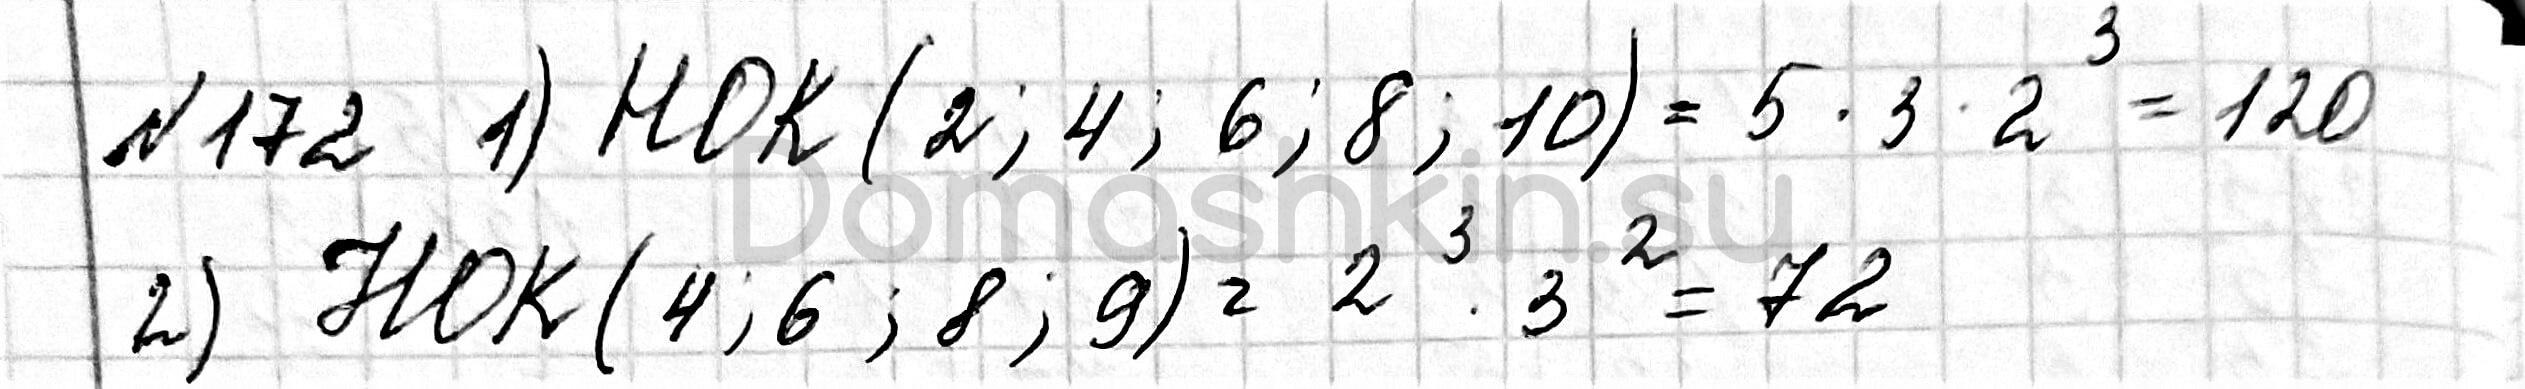 Математика 6 класс учебник Мерзляк номер 172 решение